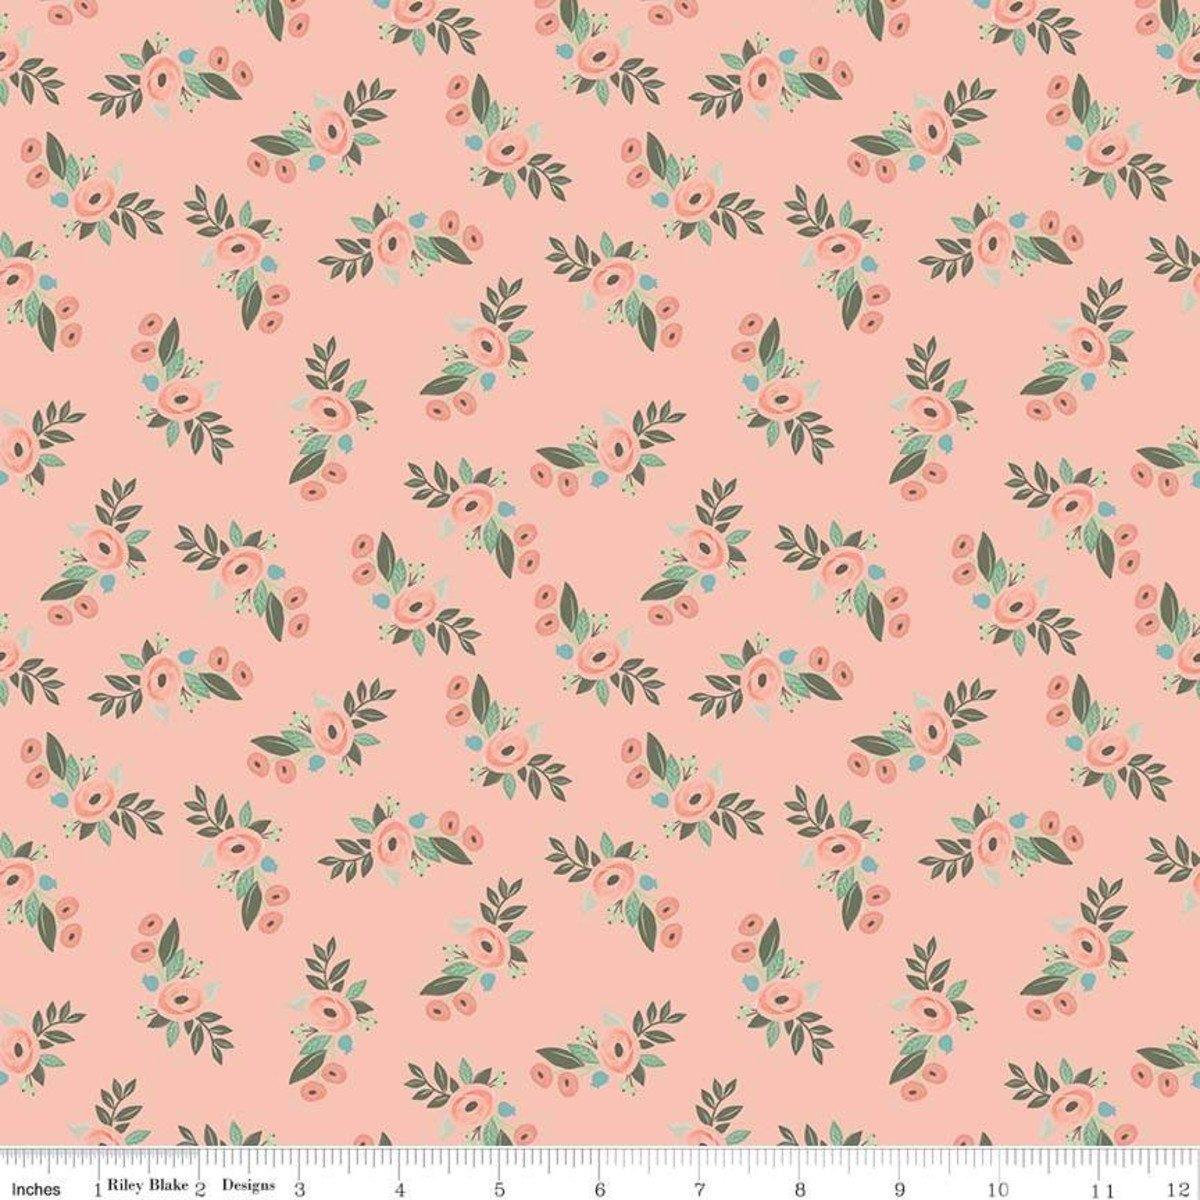 Bliss Floral Blush - c8161